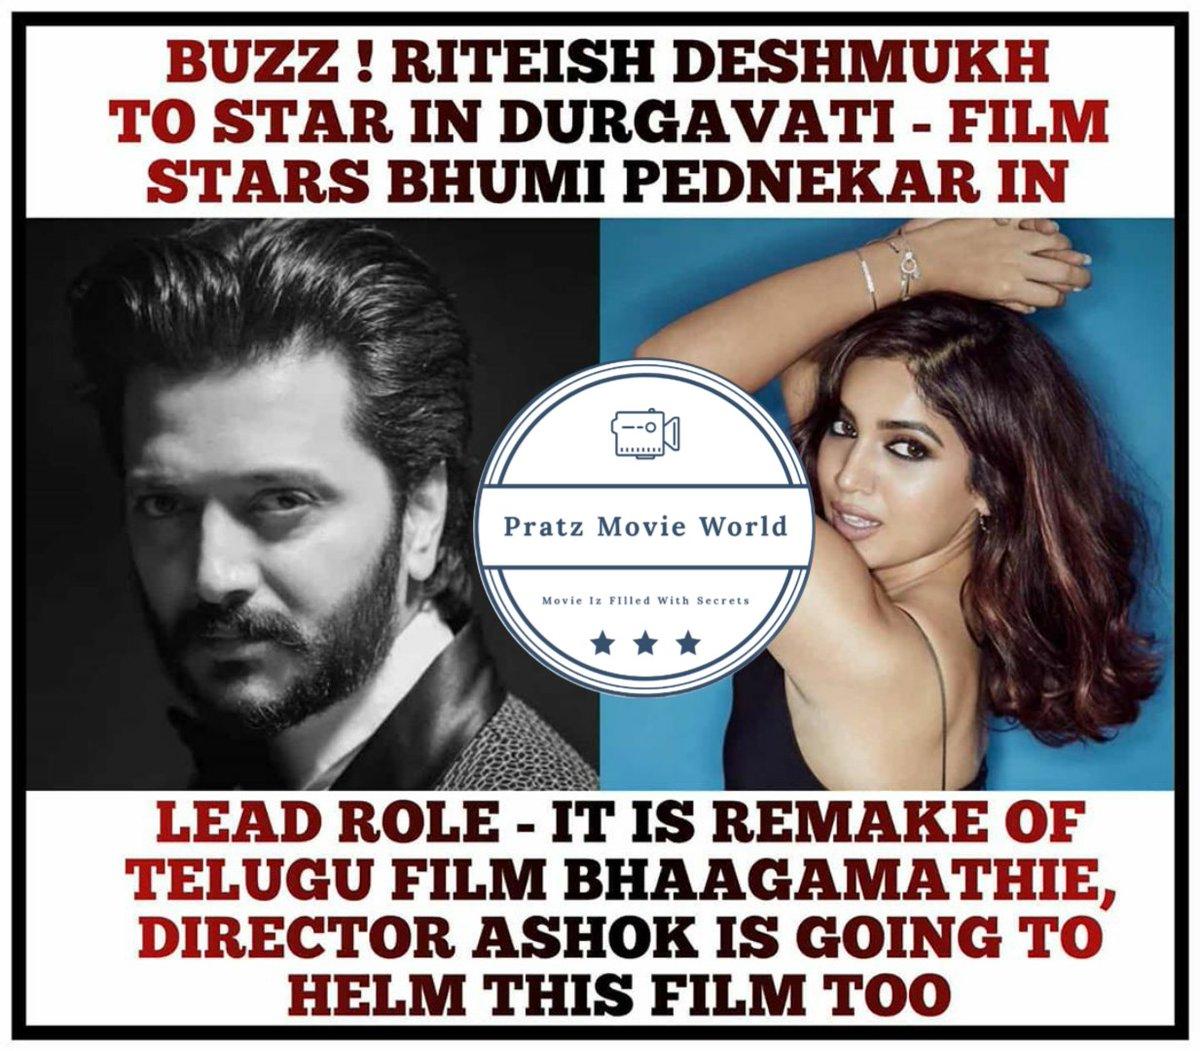 DURGAVATI #riteshdeshmukh #bhumipednekar #upcomingmovies #2020 #moviemasala #remake #star #cast #awesome #likeforlikes #follow4followback #followers #liked pic.twitter.com/hchxO6hZDV